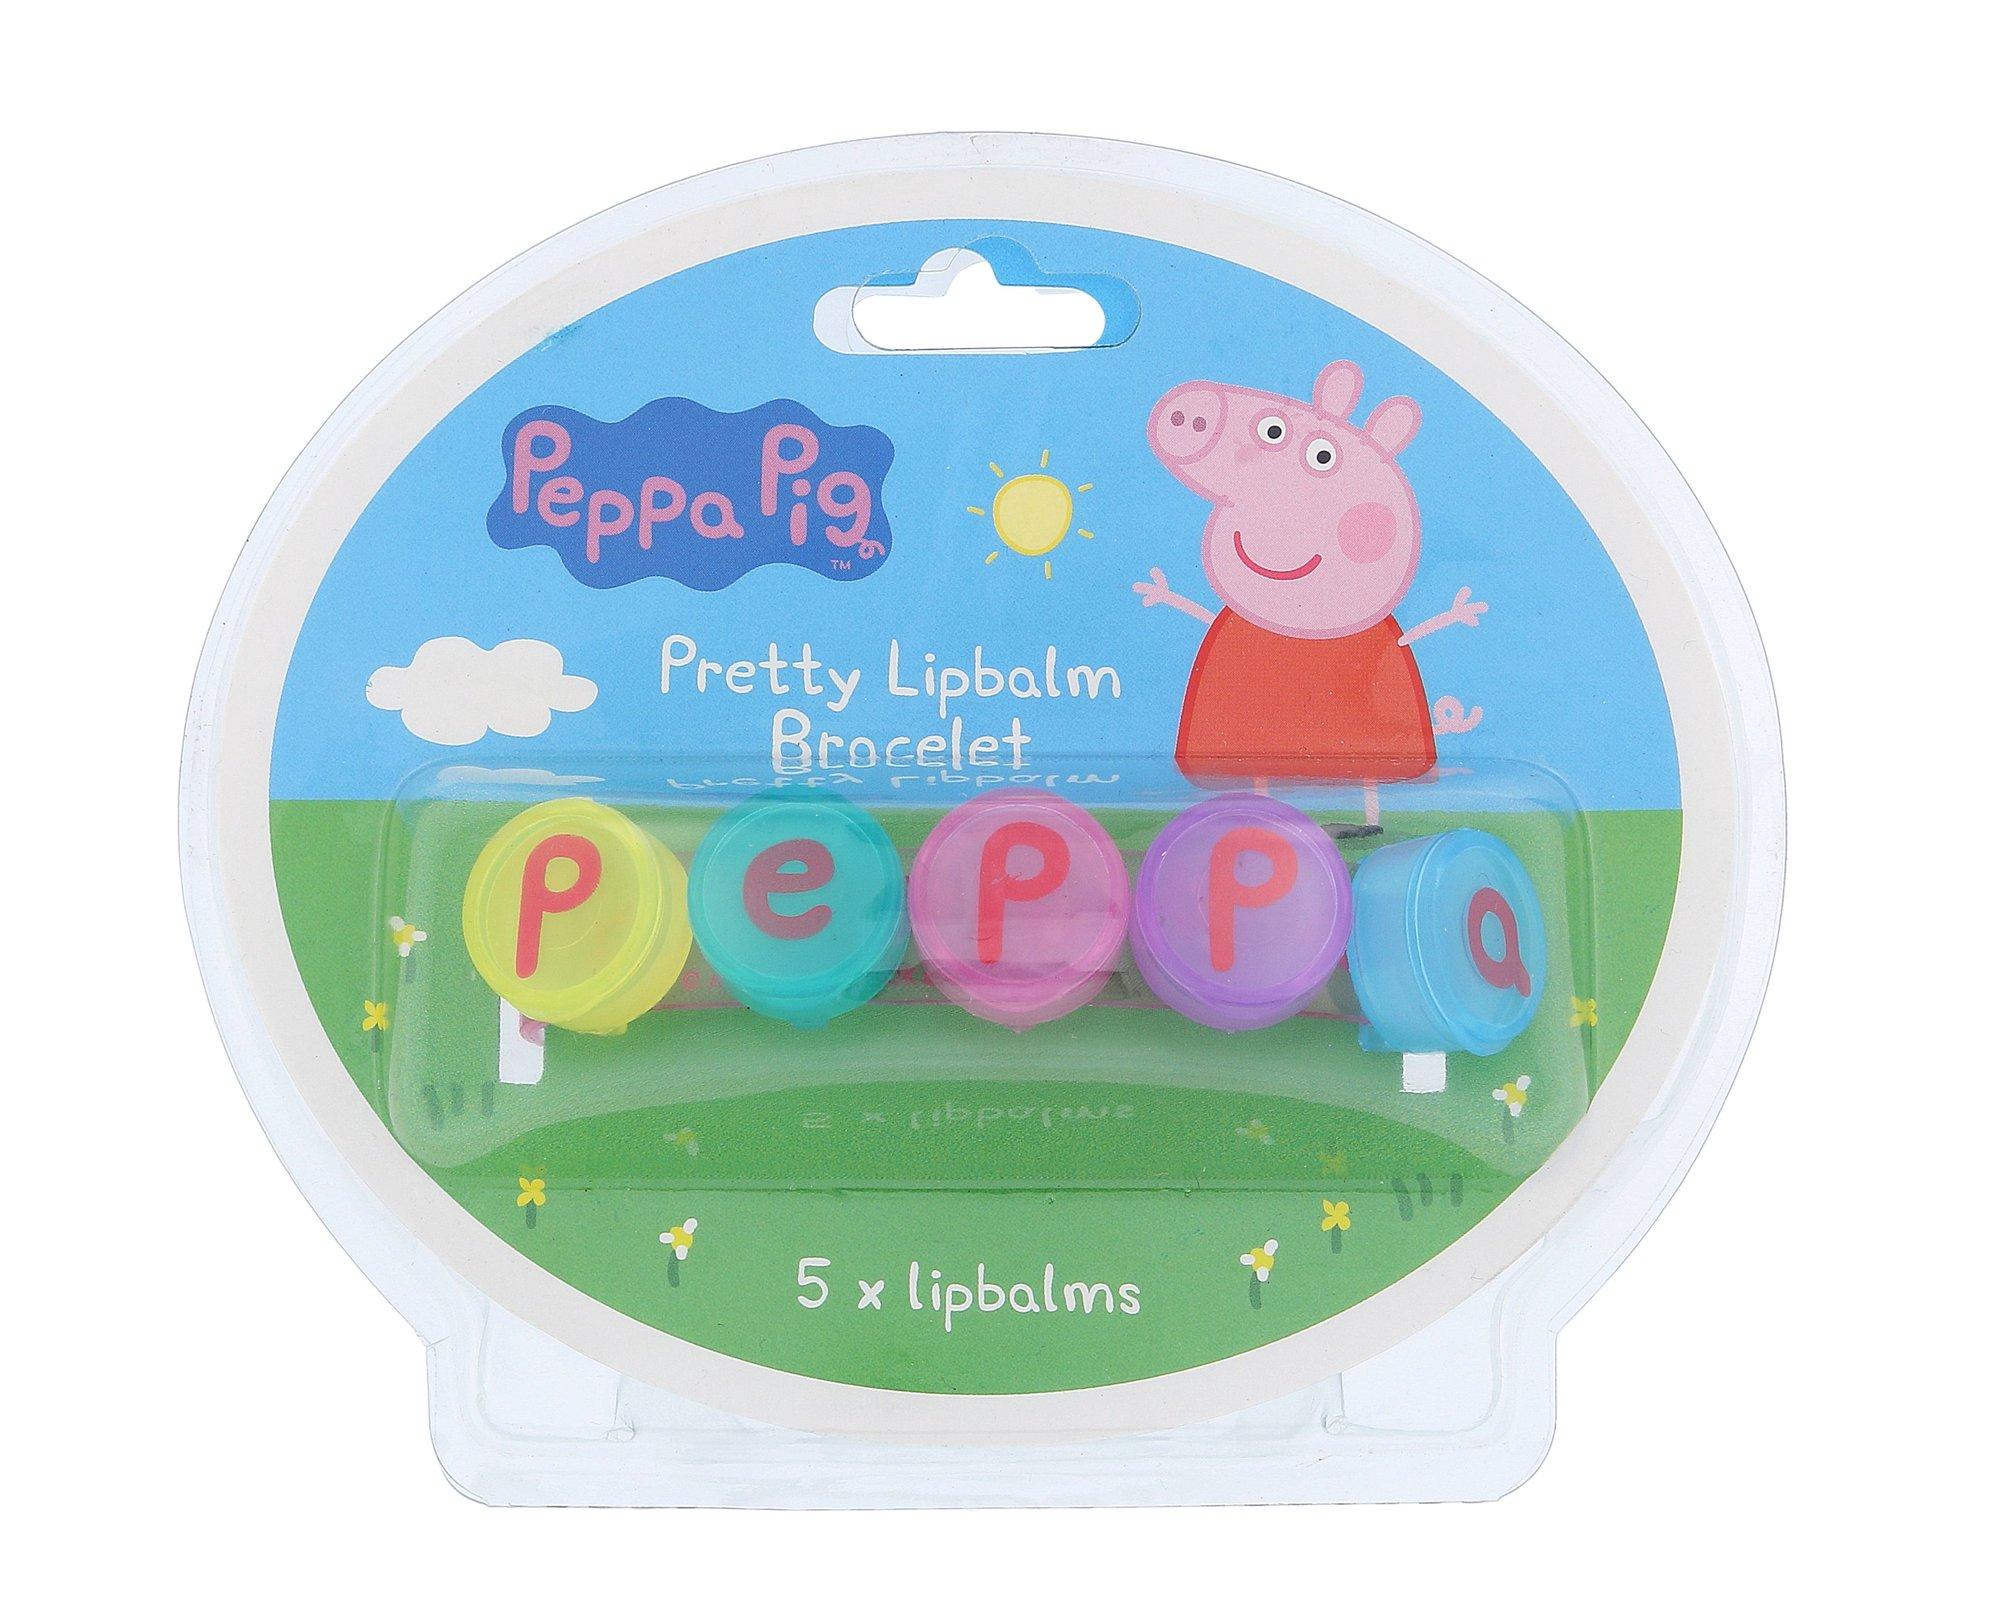 Peppa Pig Peppa Cosmetic 5ml  Pretty Lipbalm Bracelet